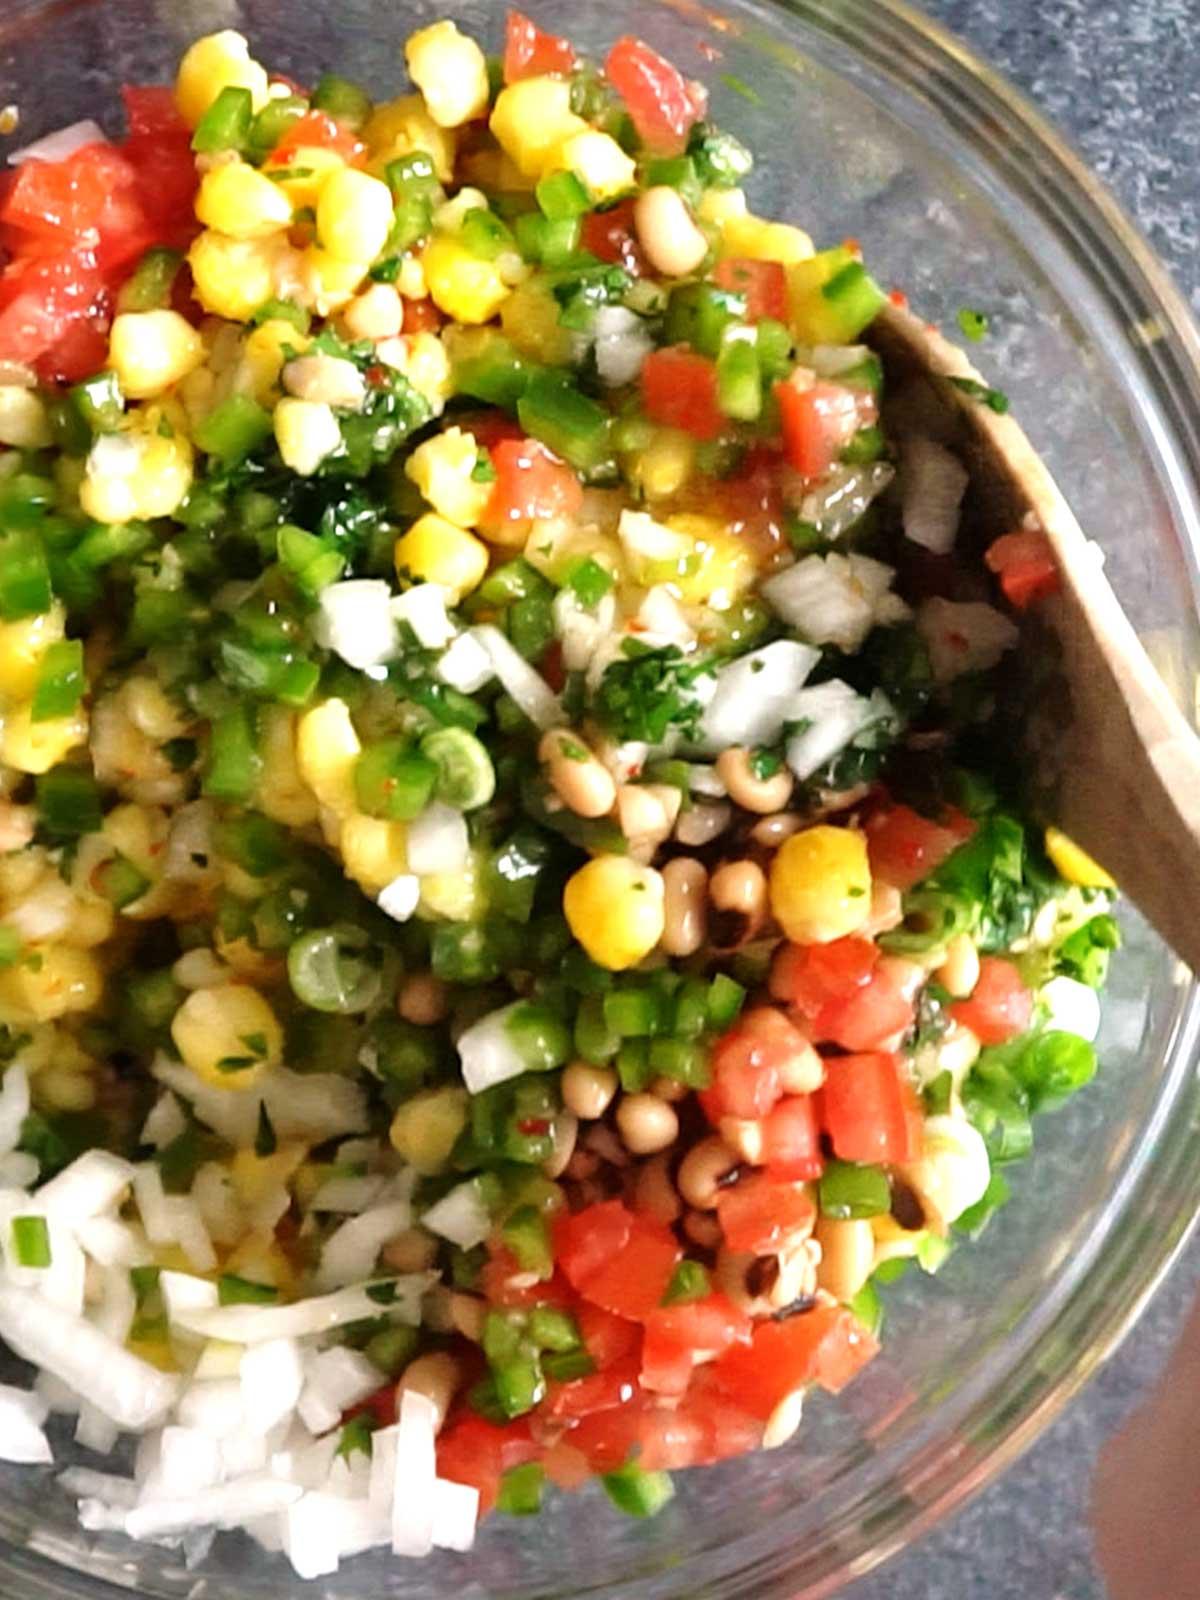 Stirring Ingredients for Texas Caviar